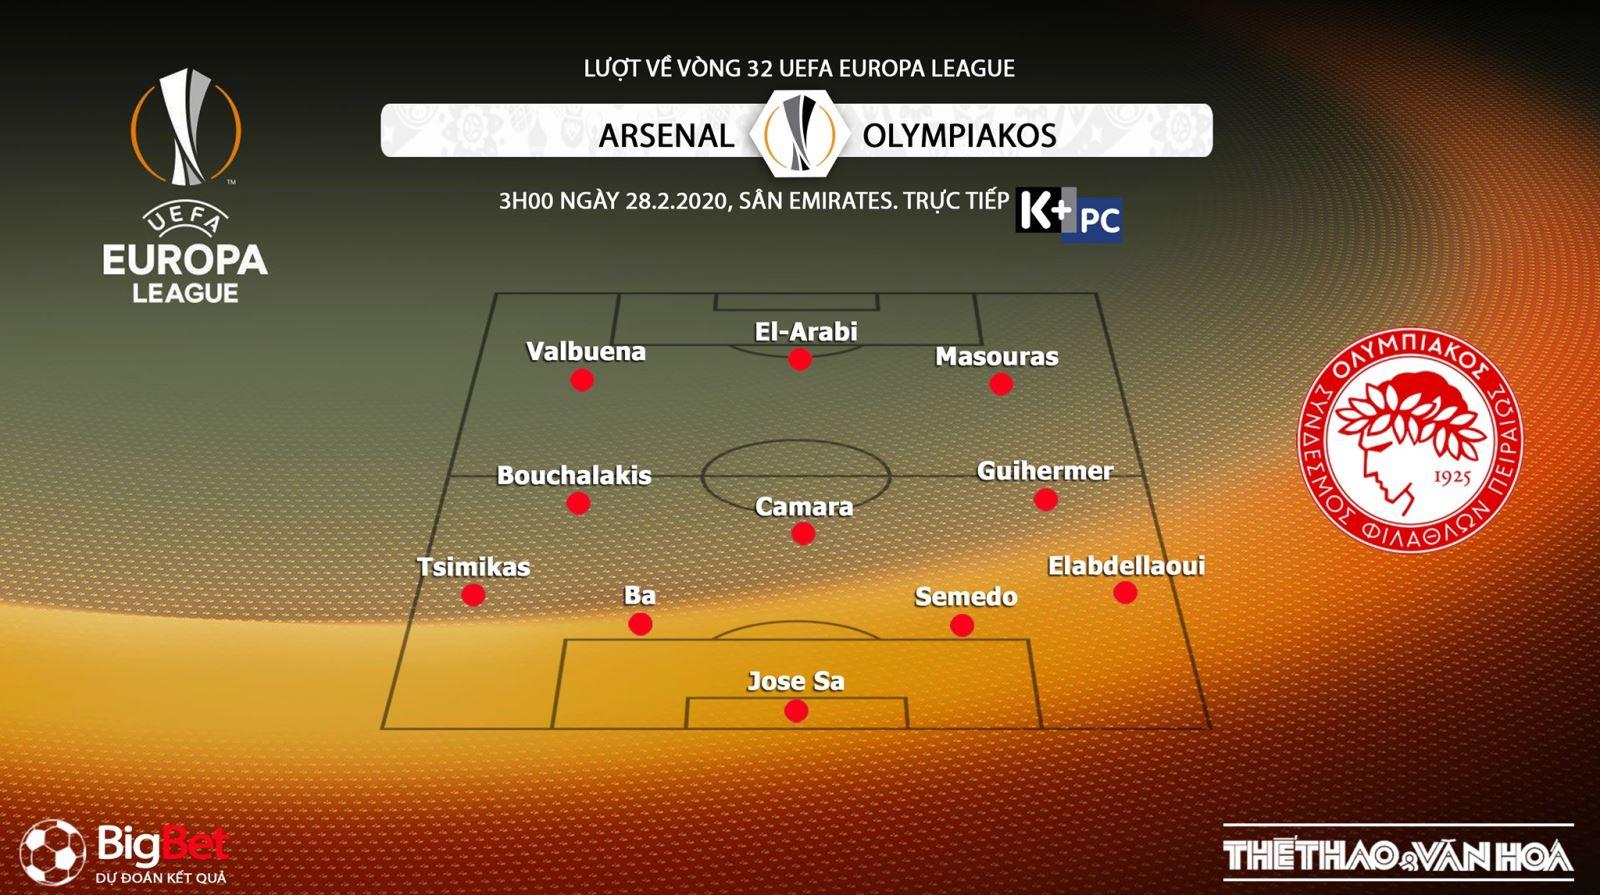 Arsenal vs Olympiacos, Arsenal, Olympiacos, trực tiếp Arsenal vs Olympiacos, nhận định Arsenal vs Olympiacos, dự đoán Arsenal vs Olympiacos, Cúp C1, K+PC, K+PM